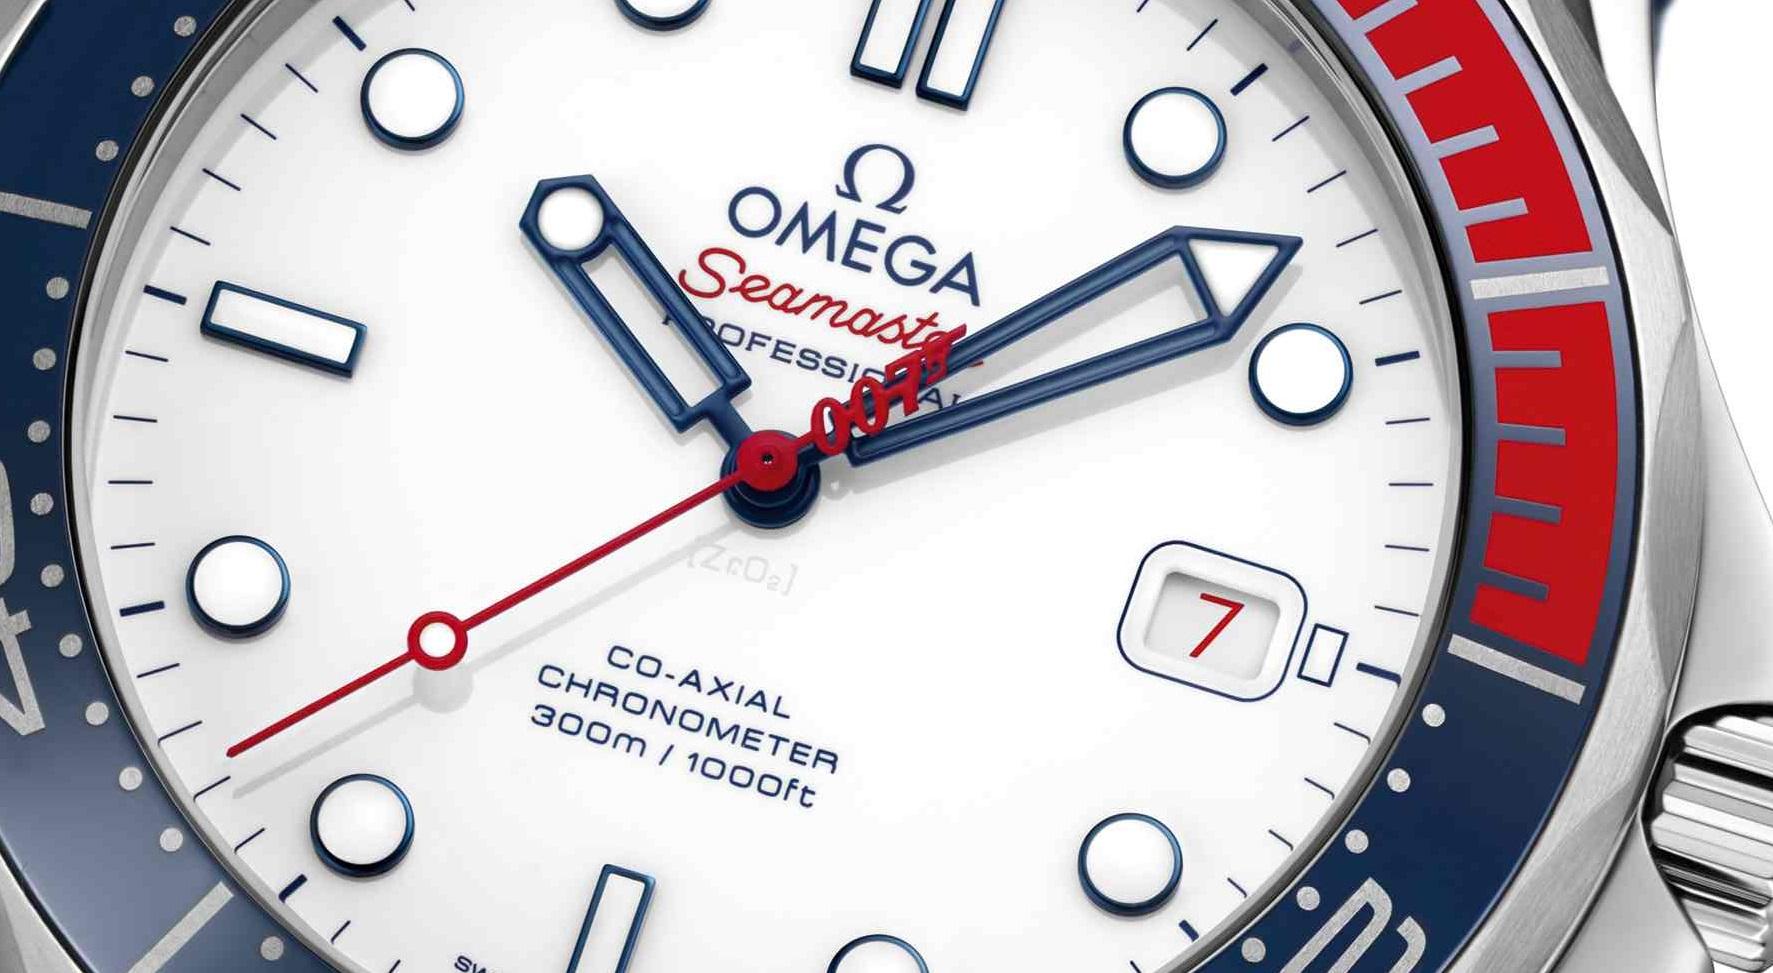 Omega_SeamasterDiver300_CommandersWatch_1